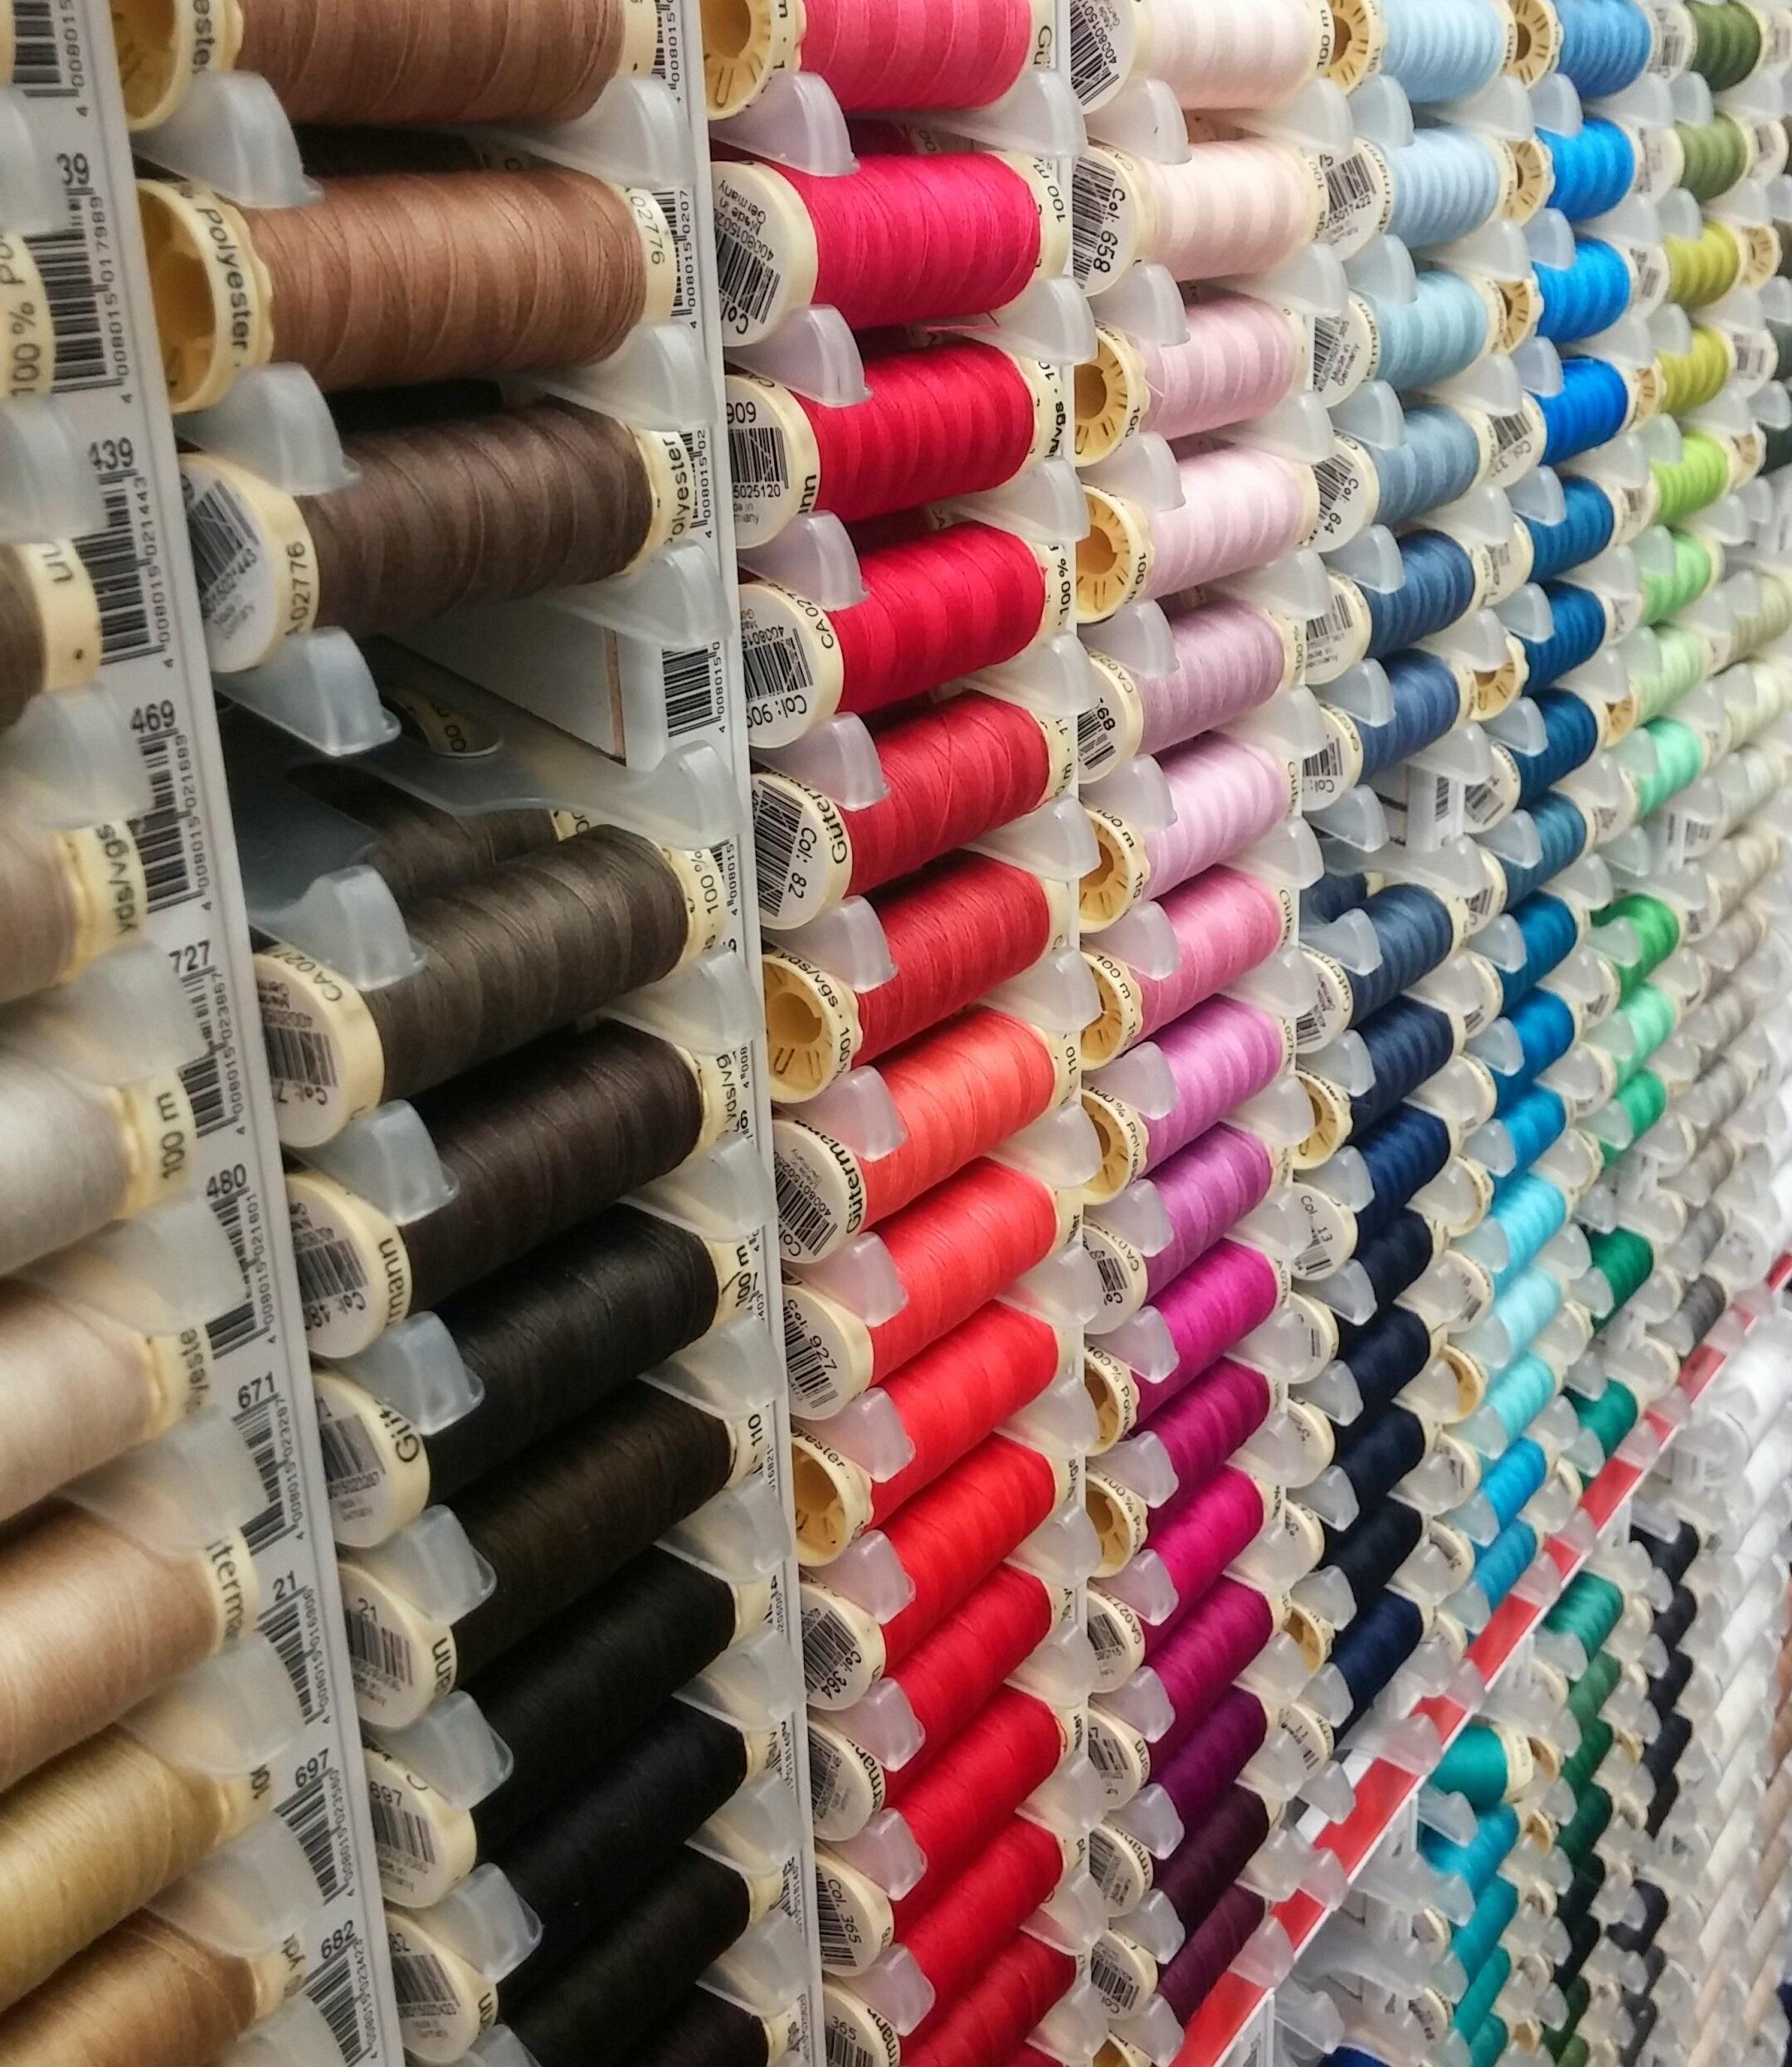 Kostenlose foto : Muster, Farbe, Material, Innenarchitektur, Nähen ...